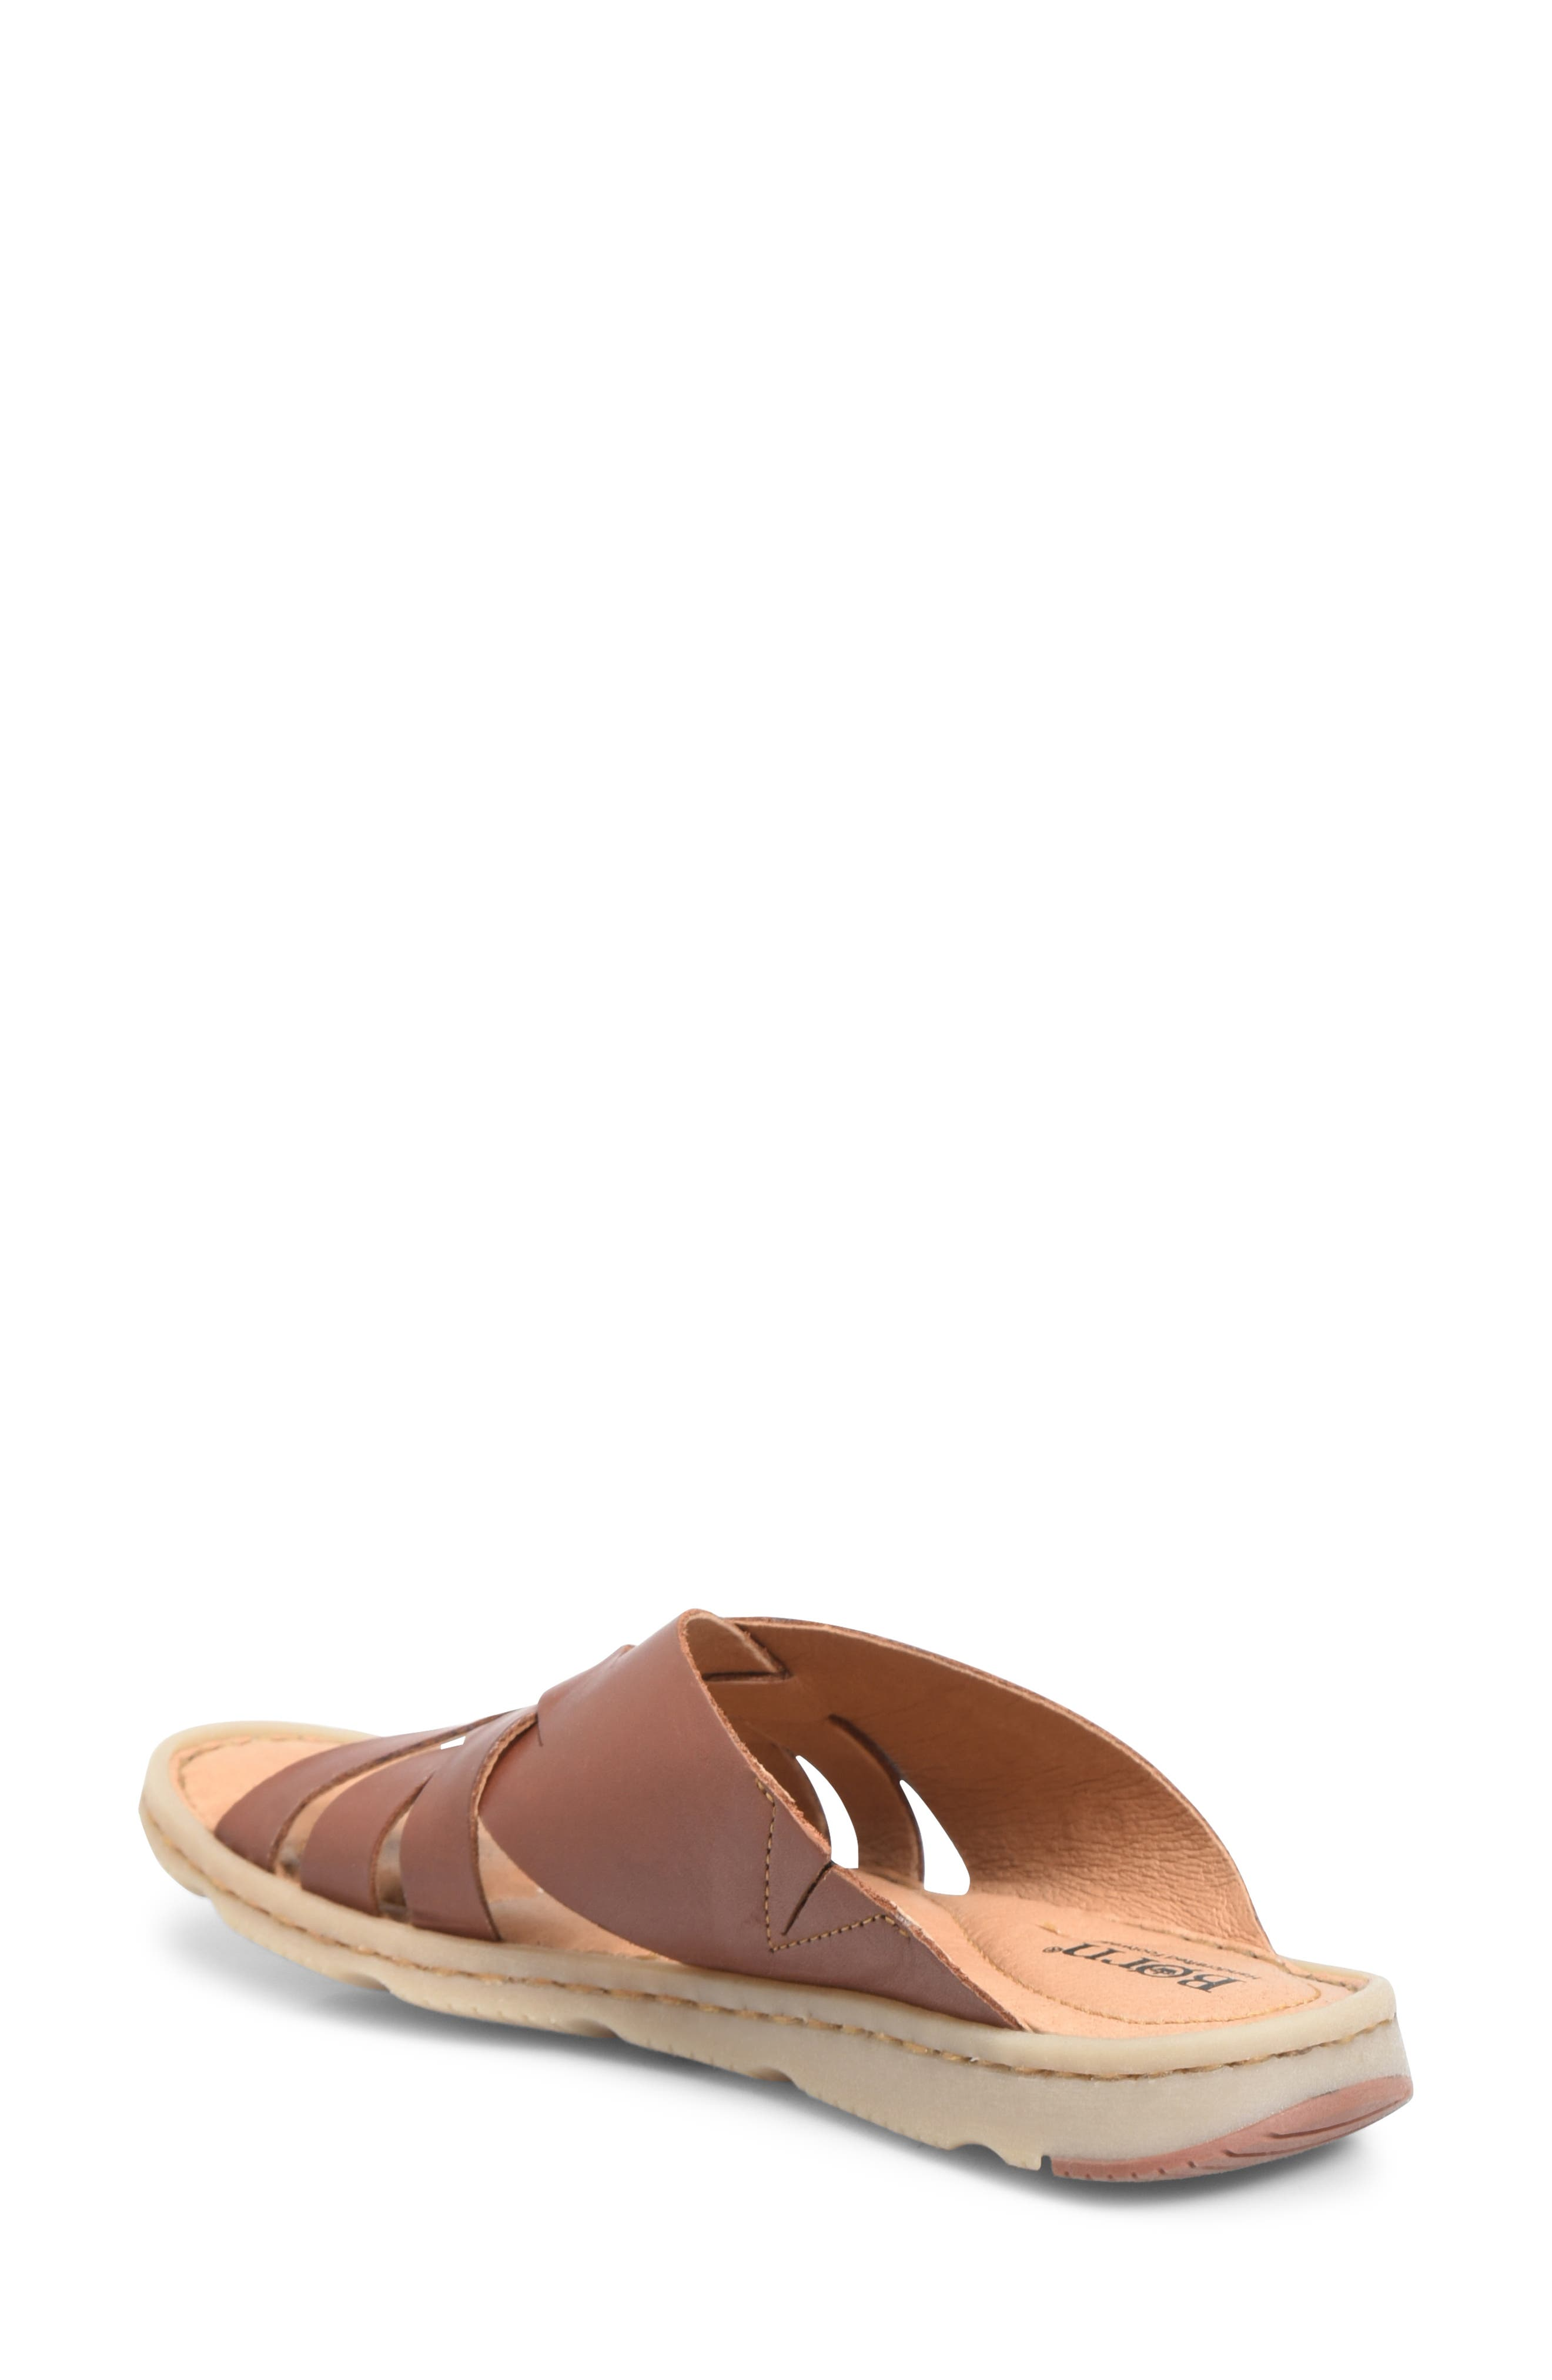 Tarpon Slide Sandal,                             Alternate thumbnail 6, color,